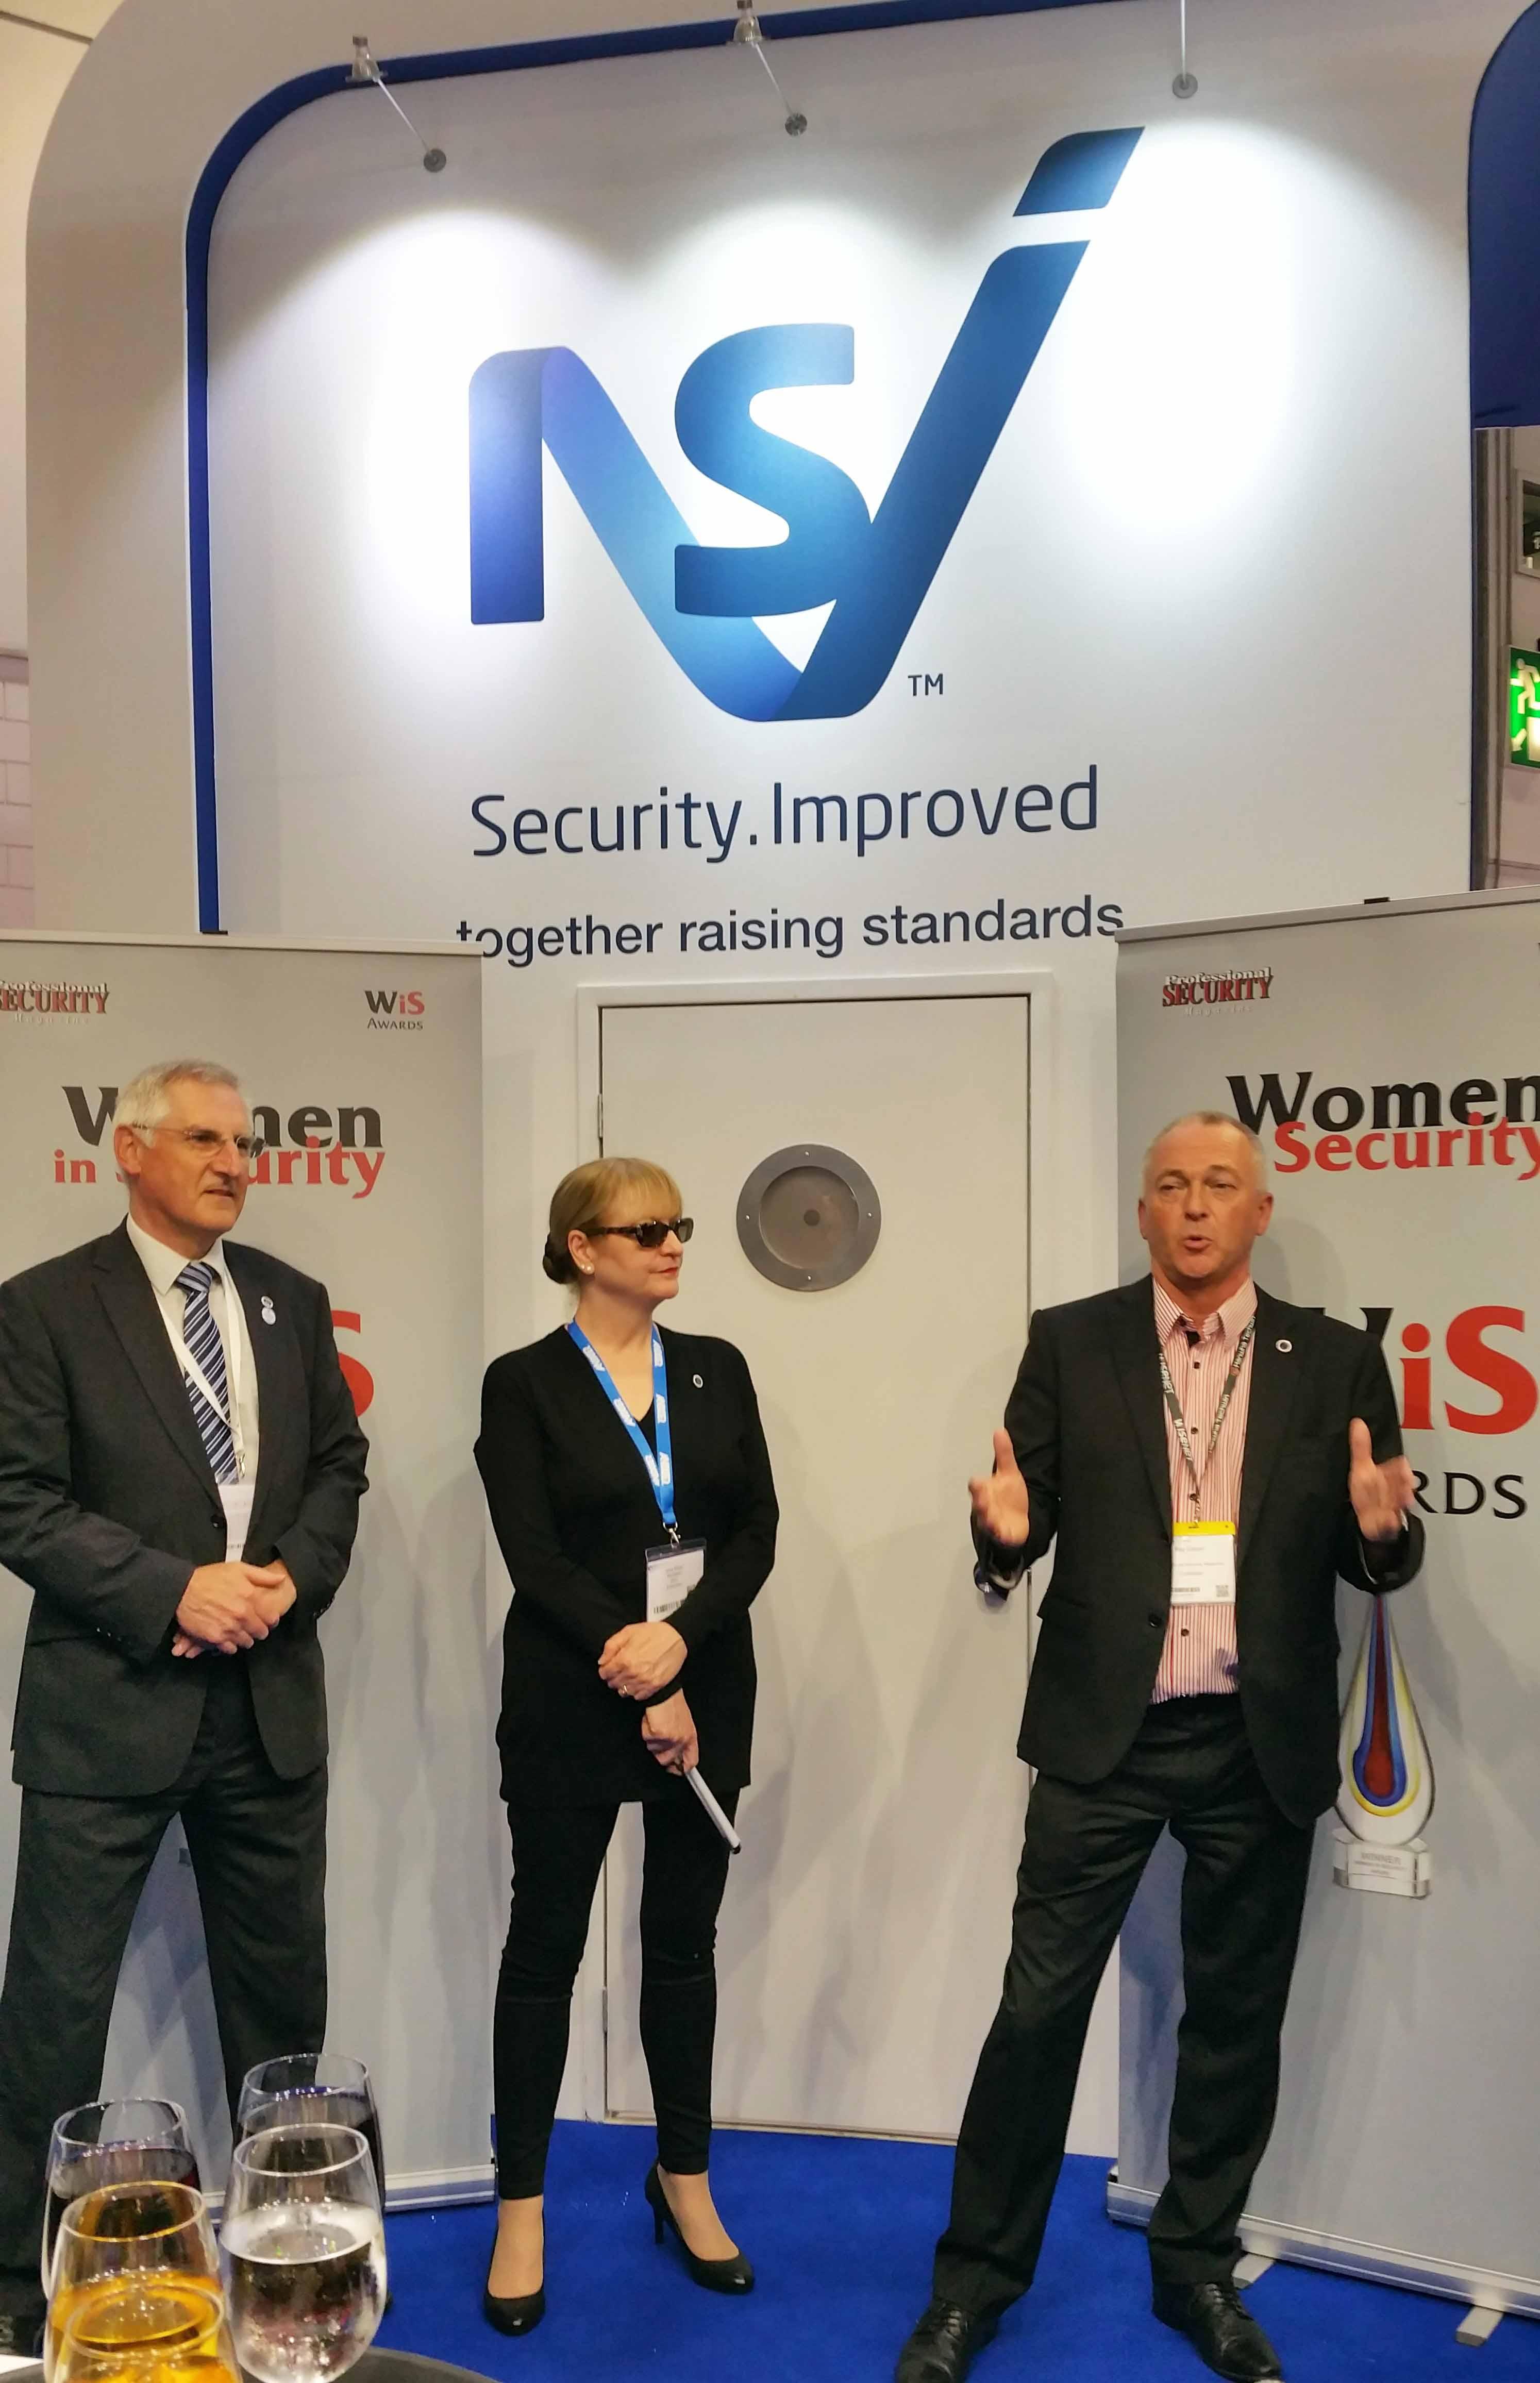 Women in Security Launch